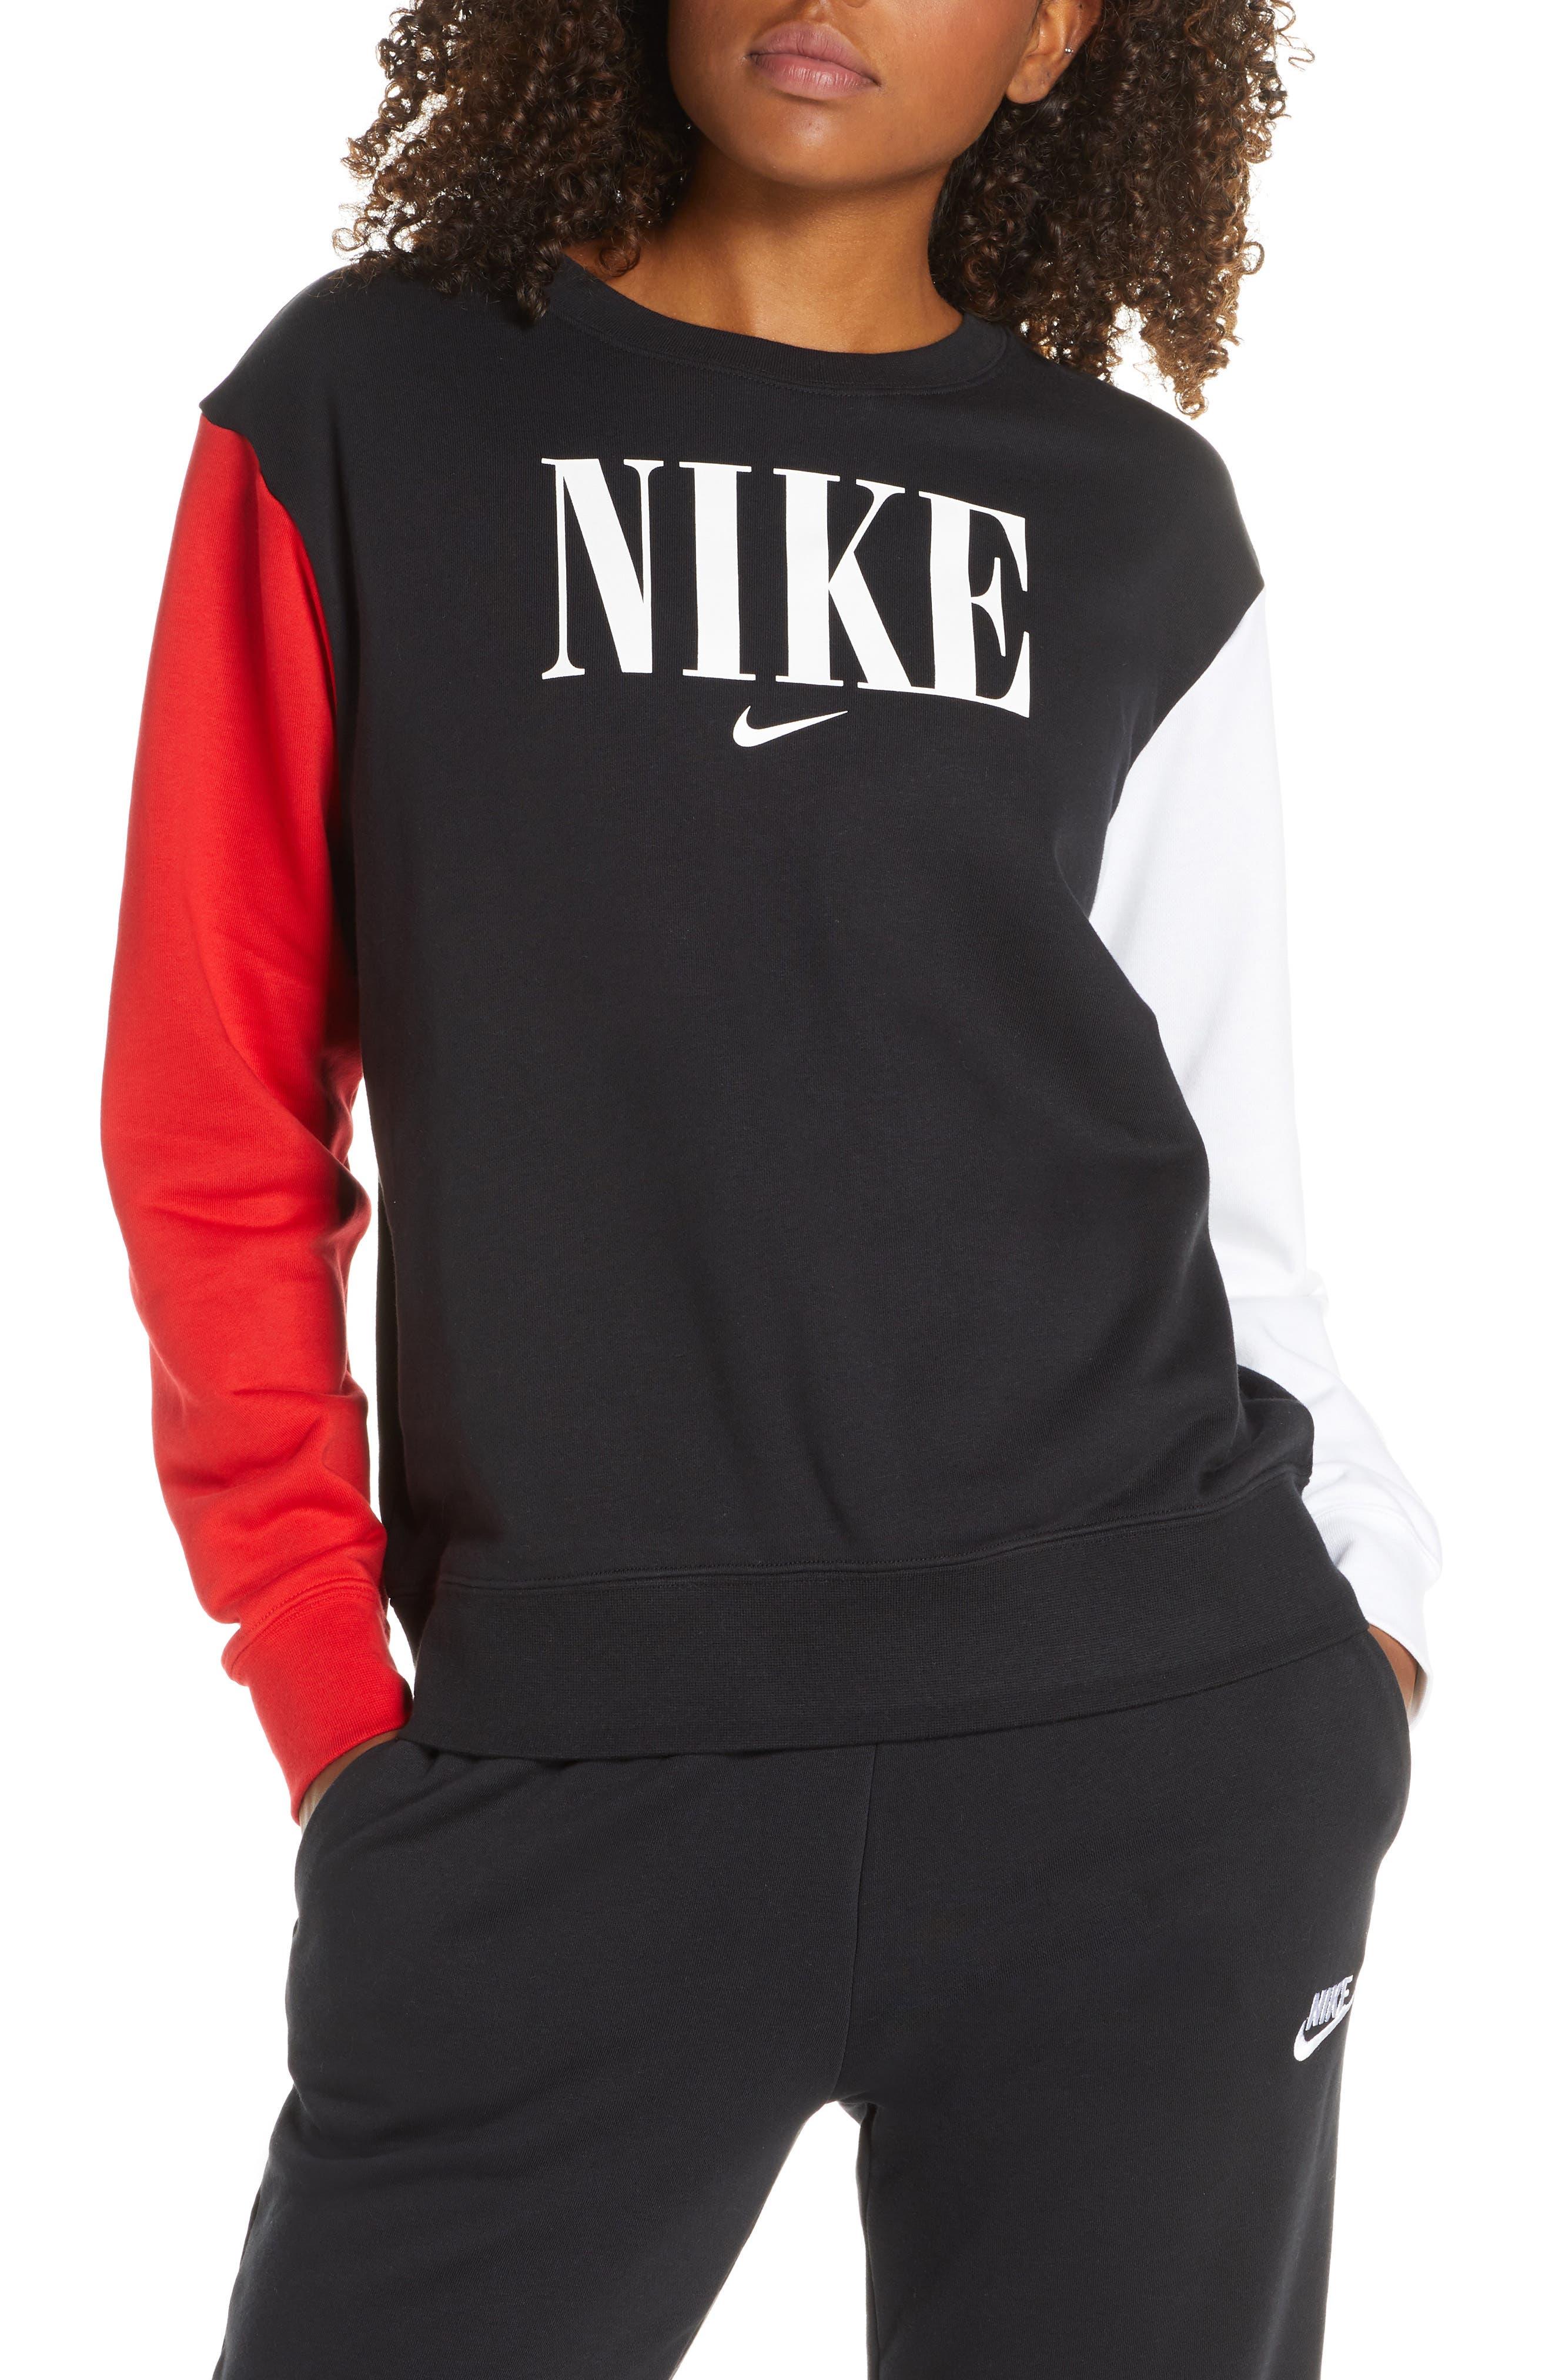 Nike Sportswear Essential Colorblock Crewneck Sweatshirt